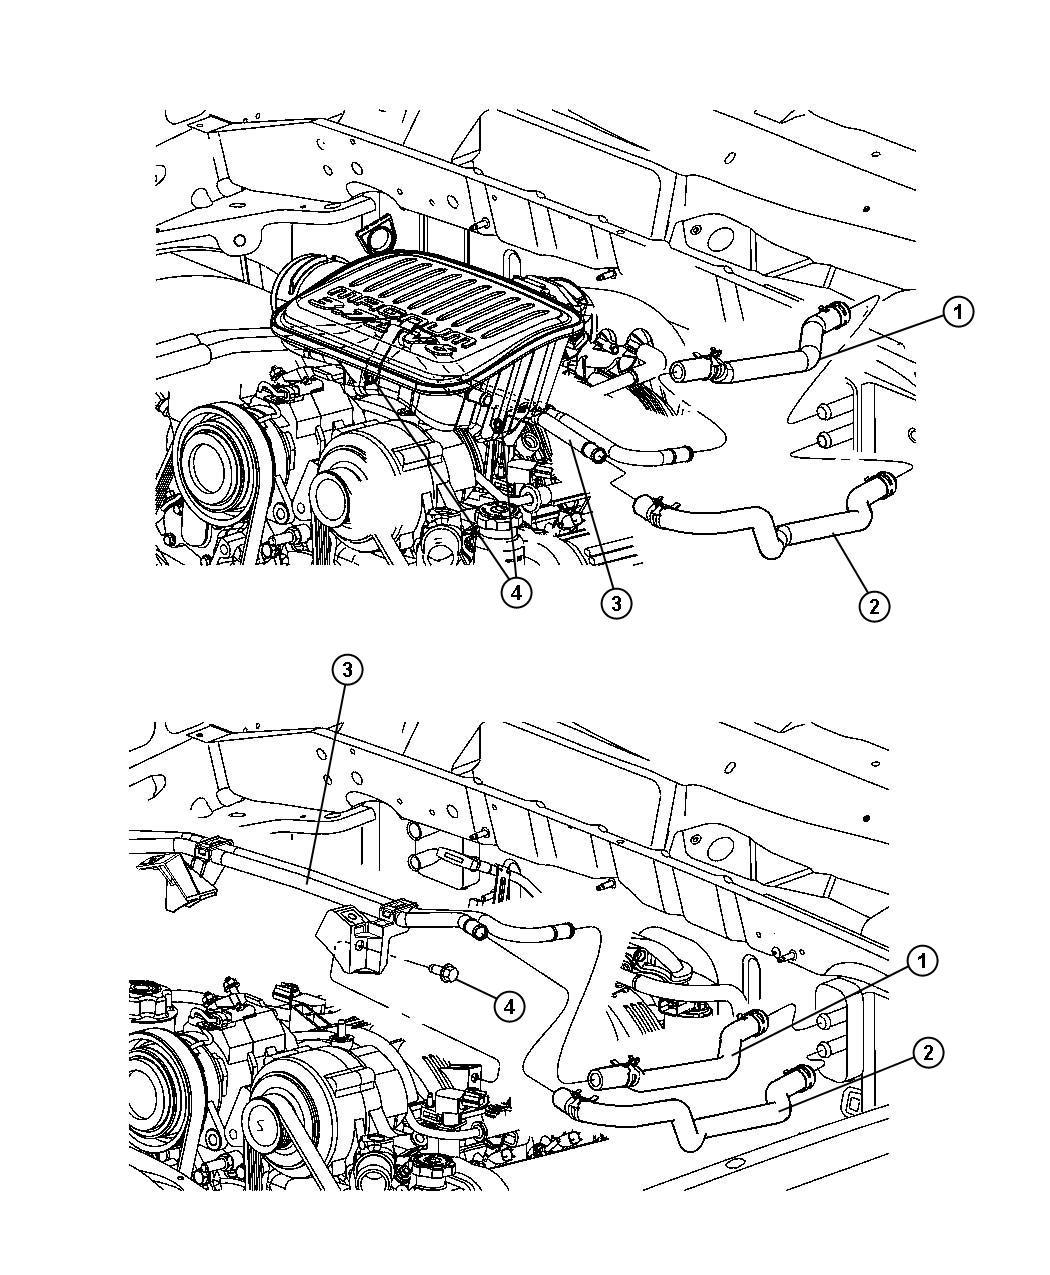 Dodge Dakota Used For Hose And Tube Used For Heater